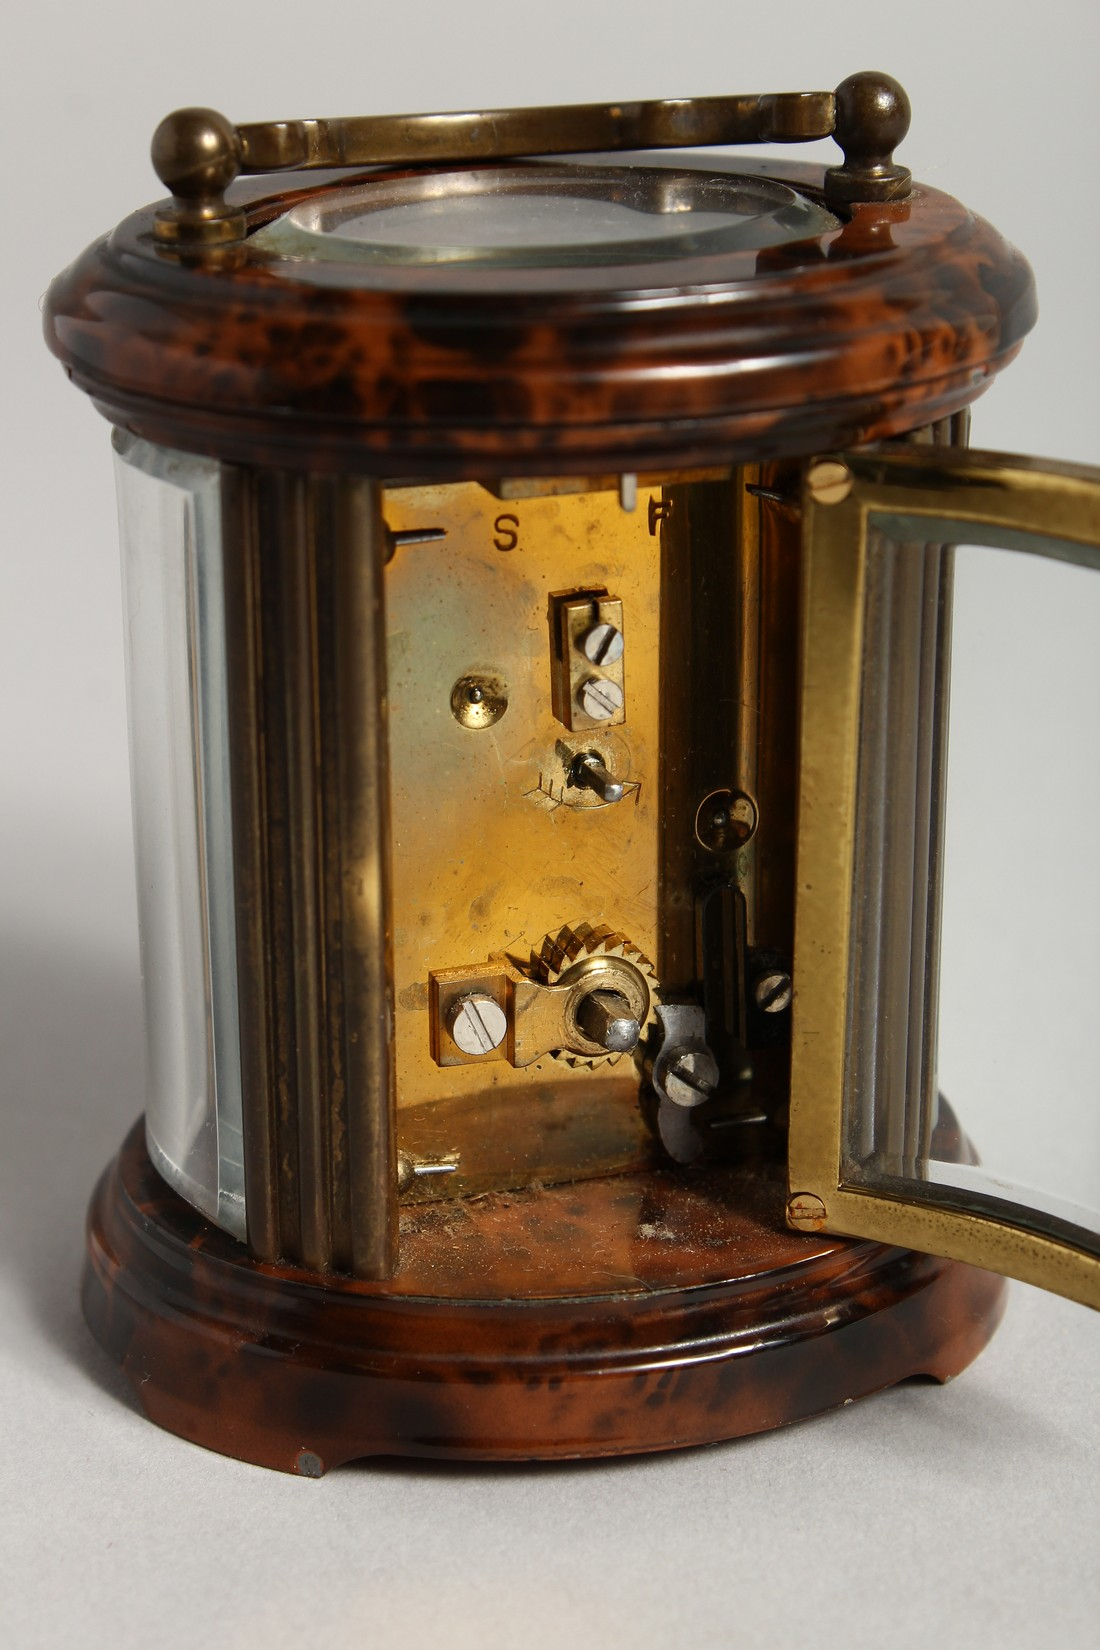 A GOOD CIRCULAR BRASS CARRIAGE CLOCK, MATTHEW NORMAN, LONDON. 3ins high - Image 4 of 7